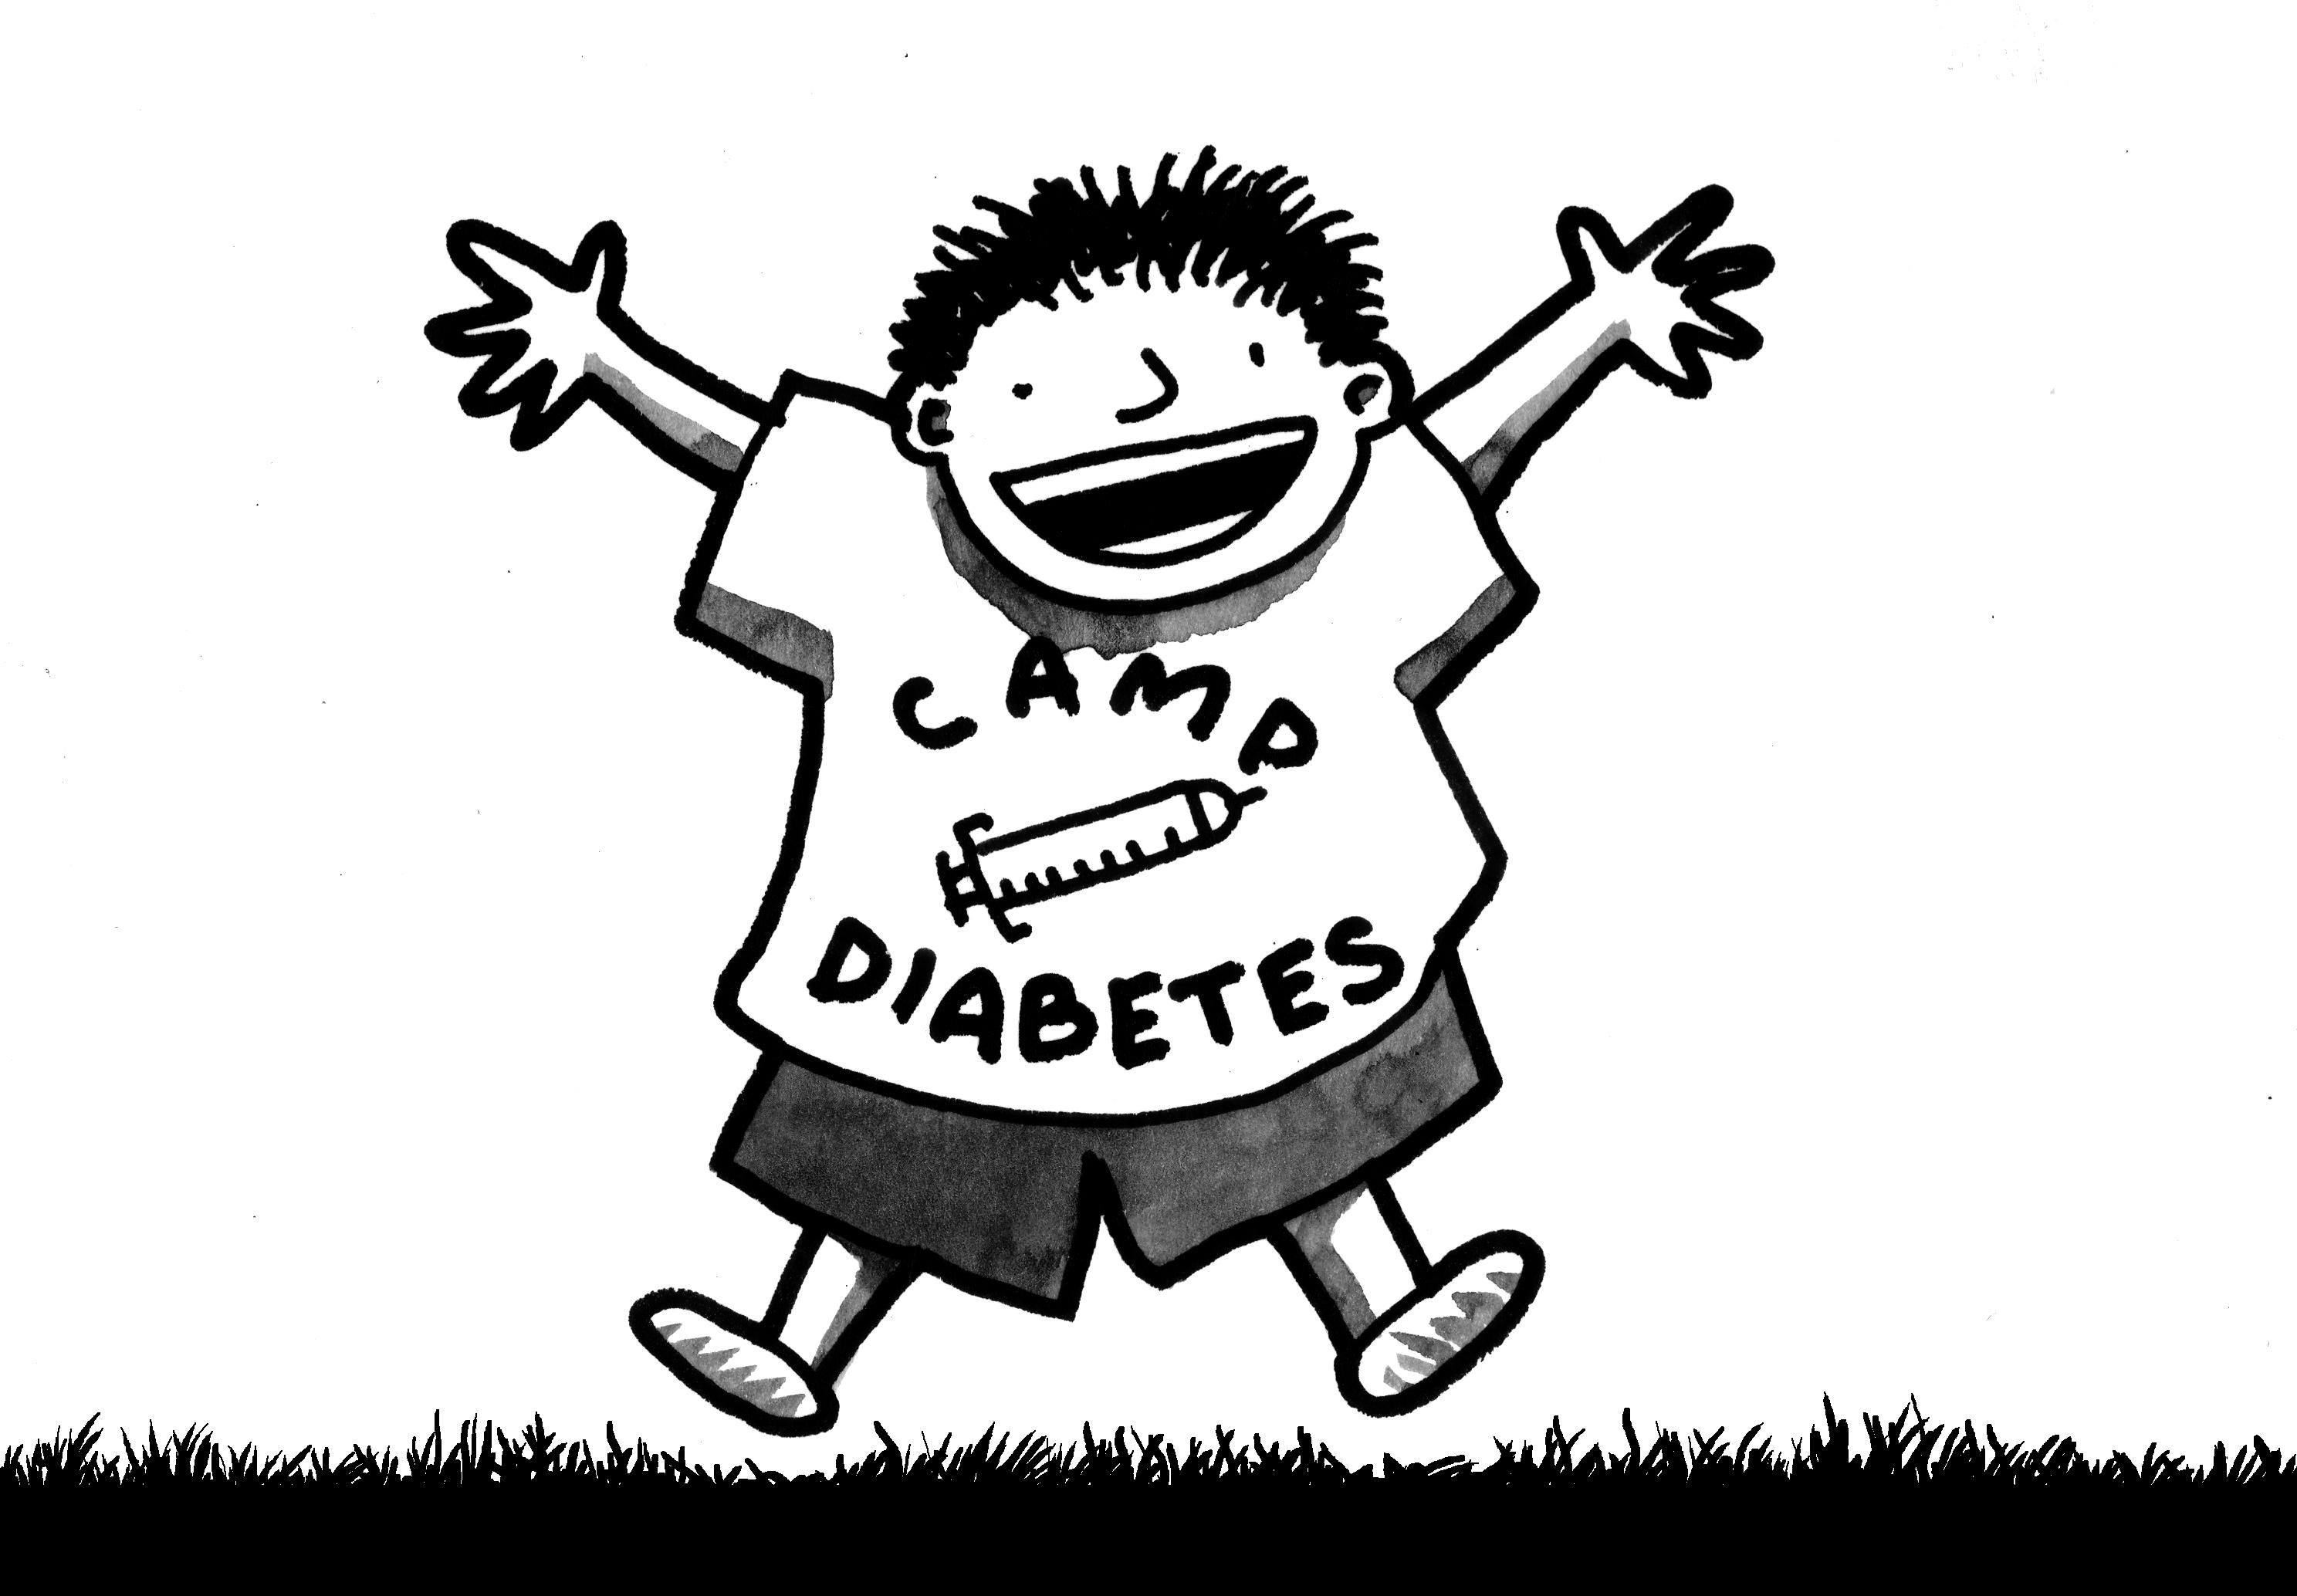 campdiabetes_01